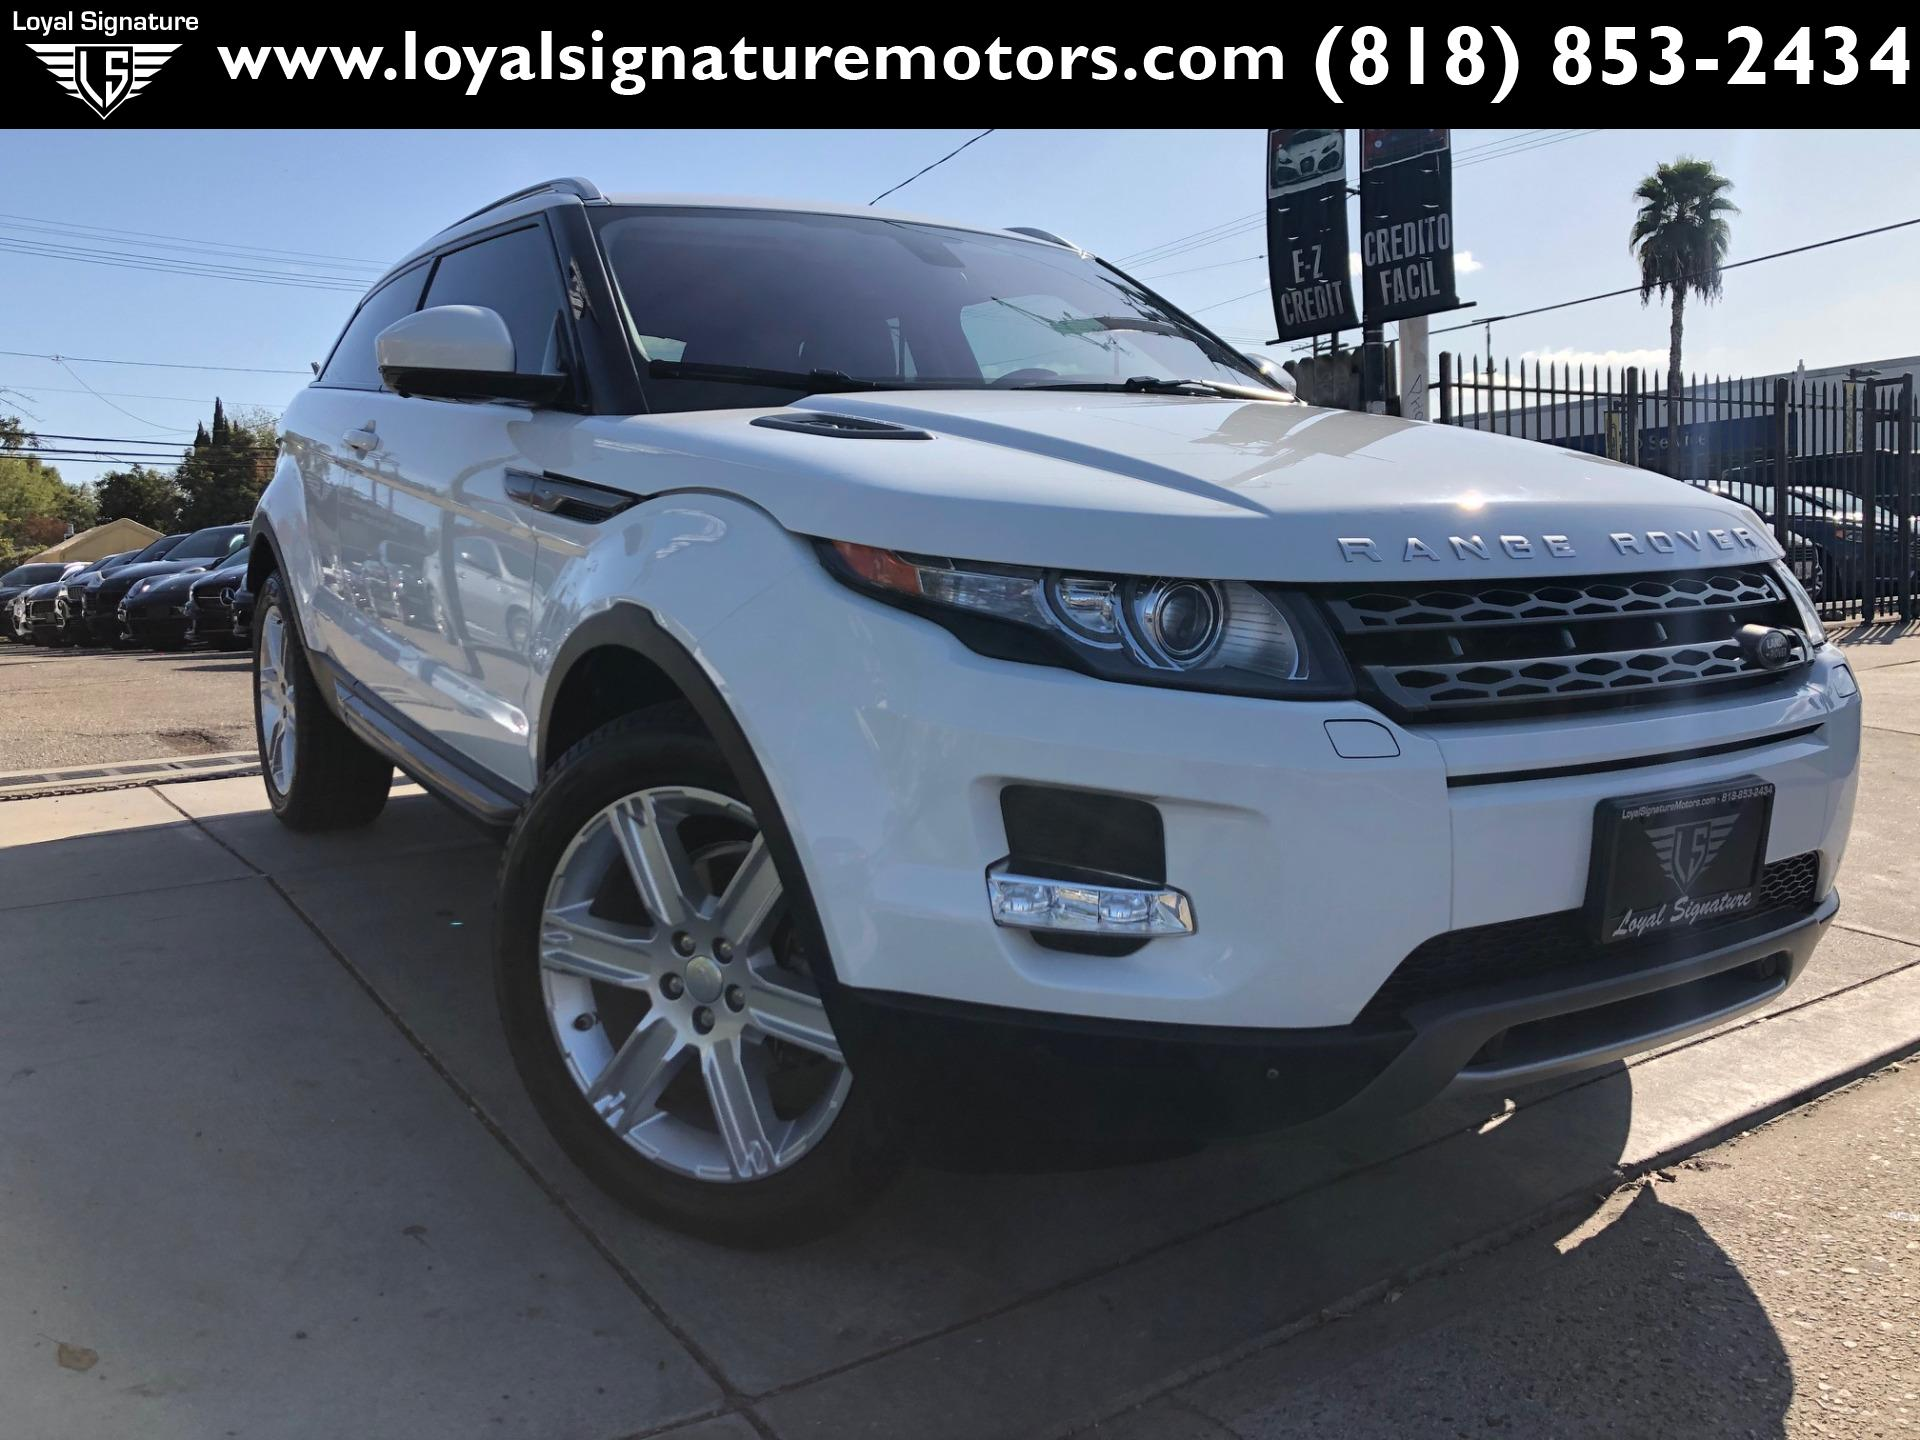 Used 2015 Land Rover Range Rover Evoque Coupe Pure Premium | Van Nuys, CA